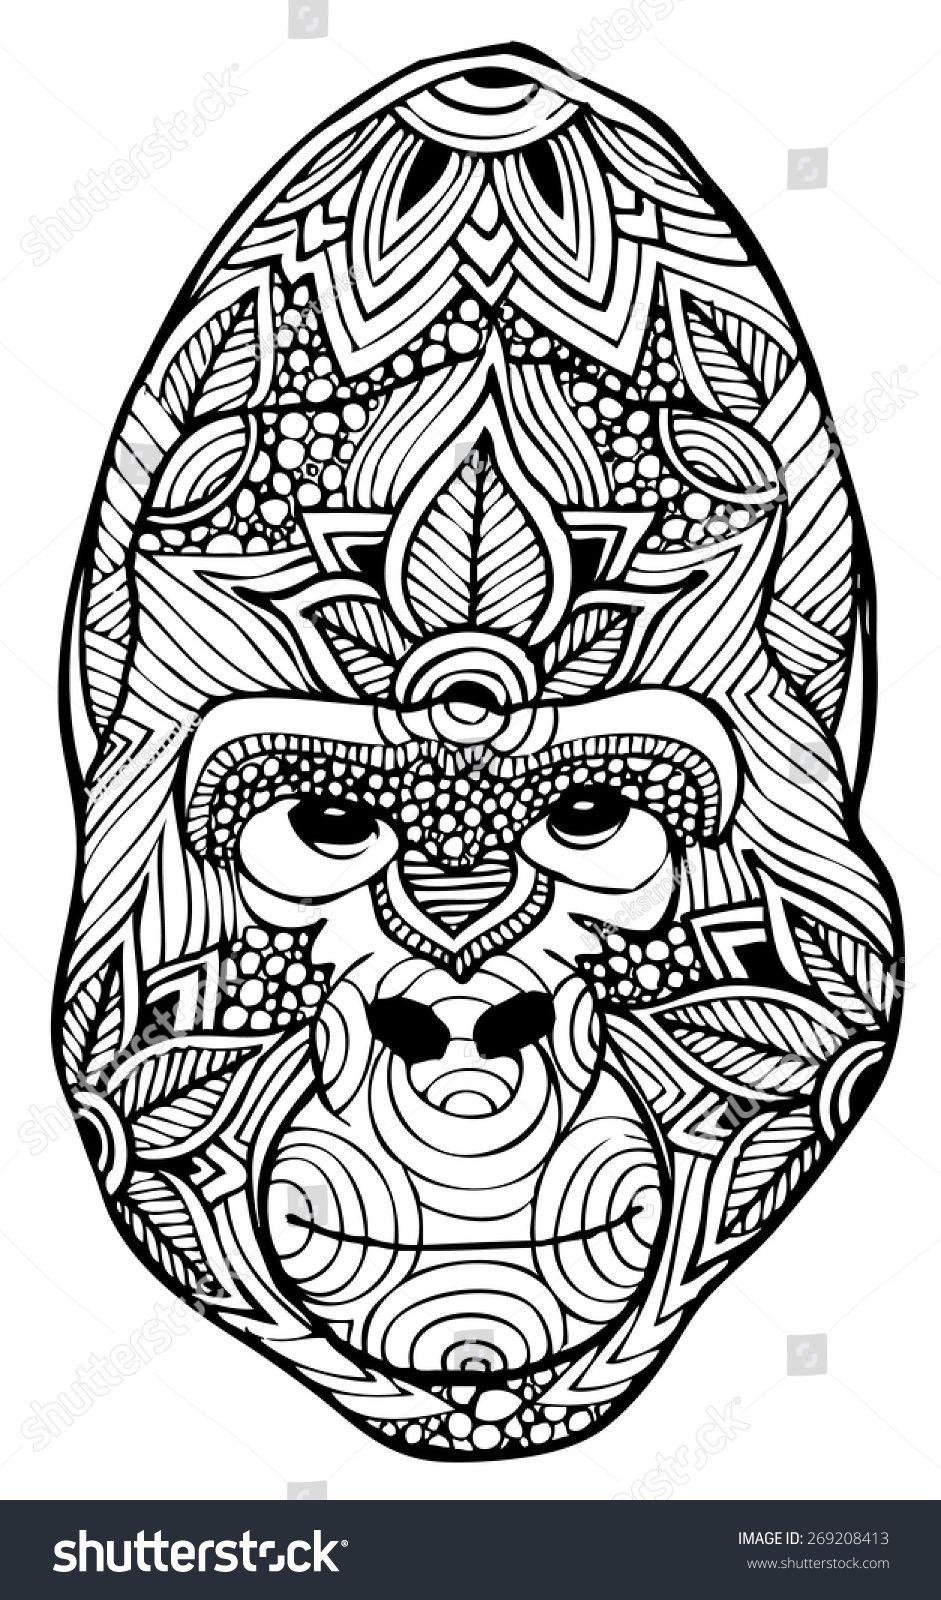 Zentangle Style Gorilla Vector Animal Coloring Pages Cute Coloring Pages Zentangle